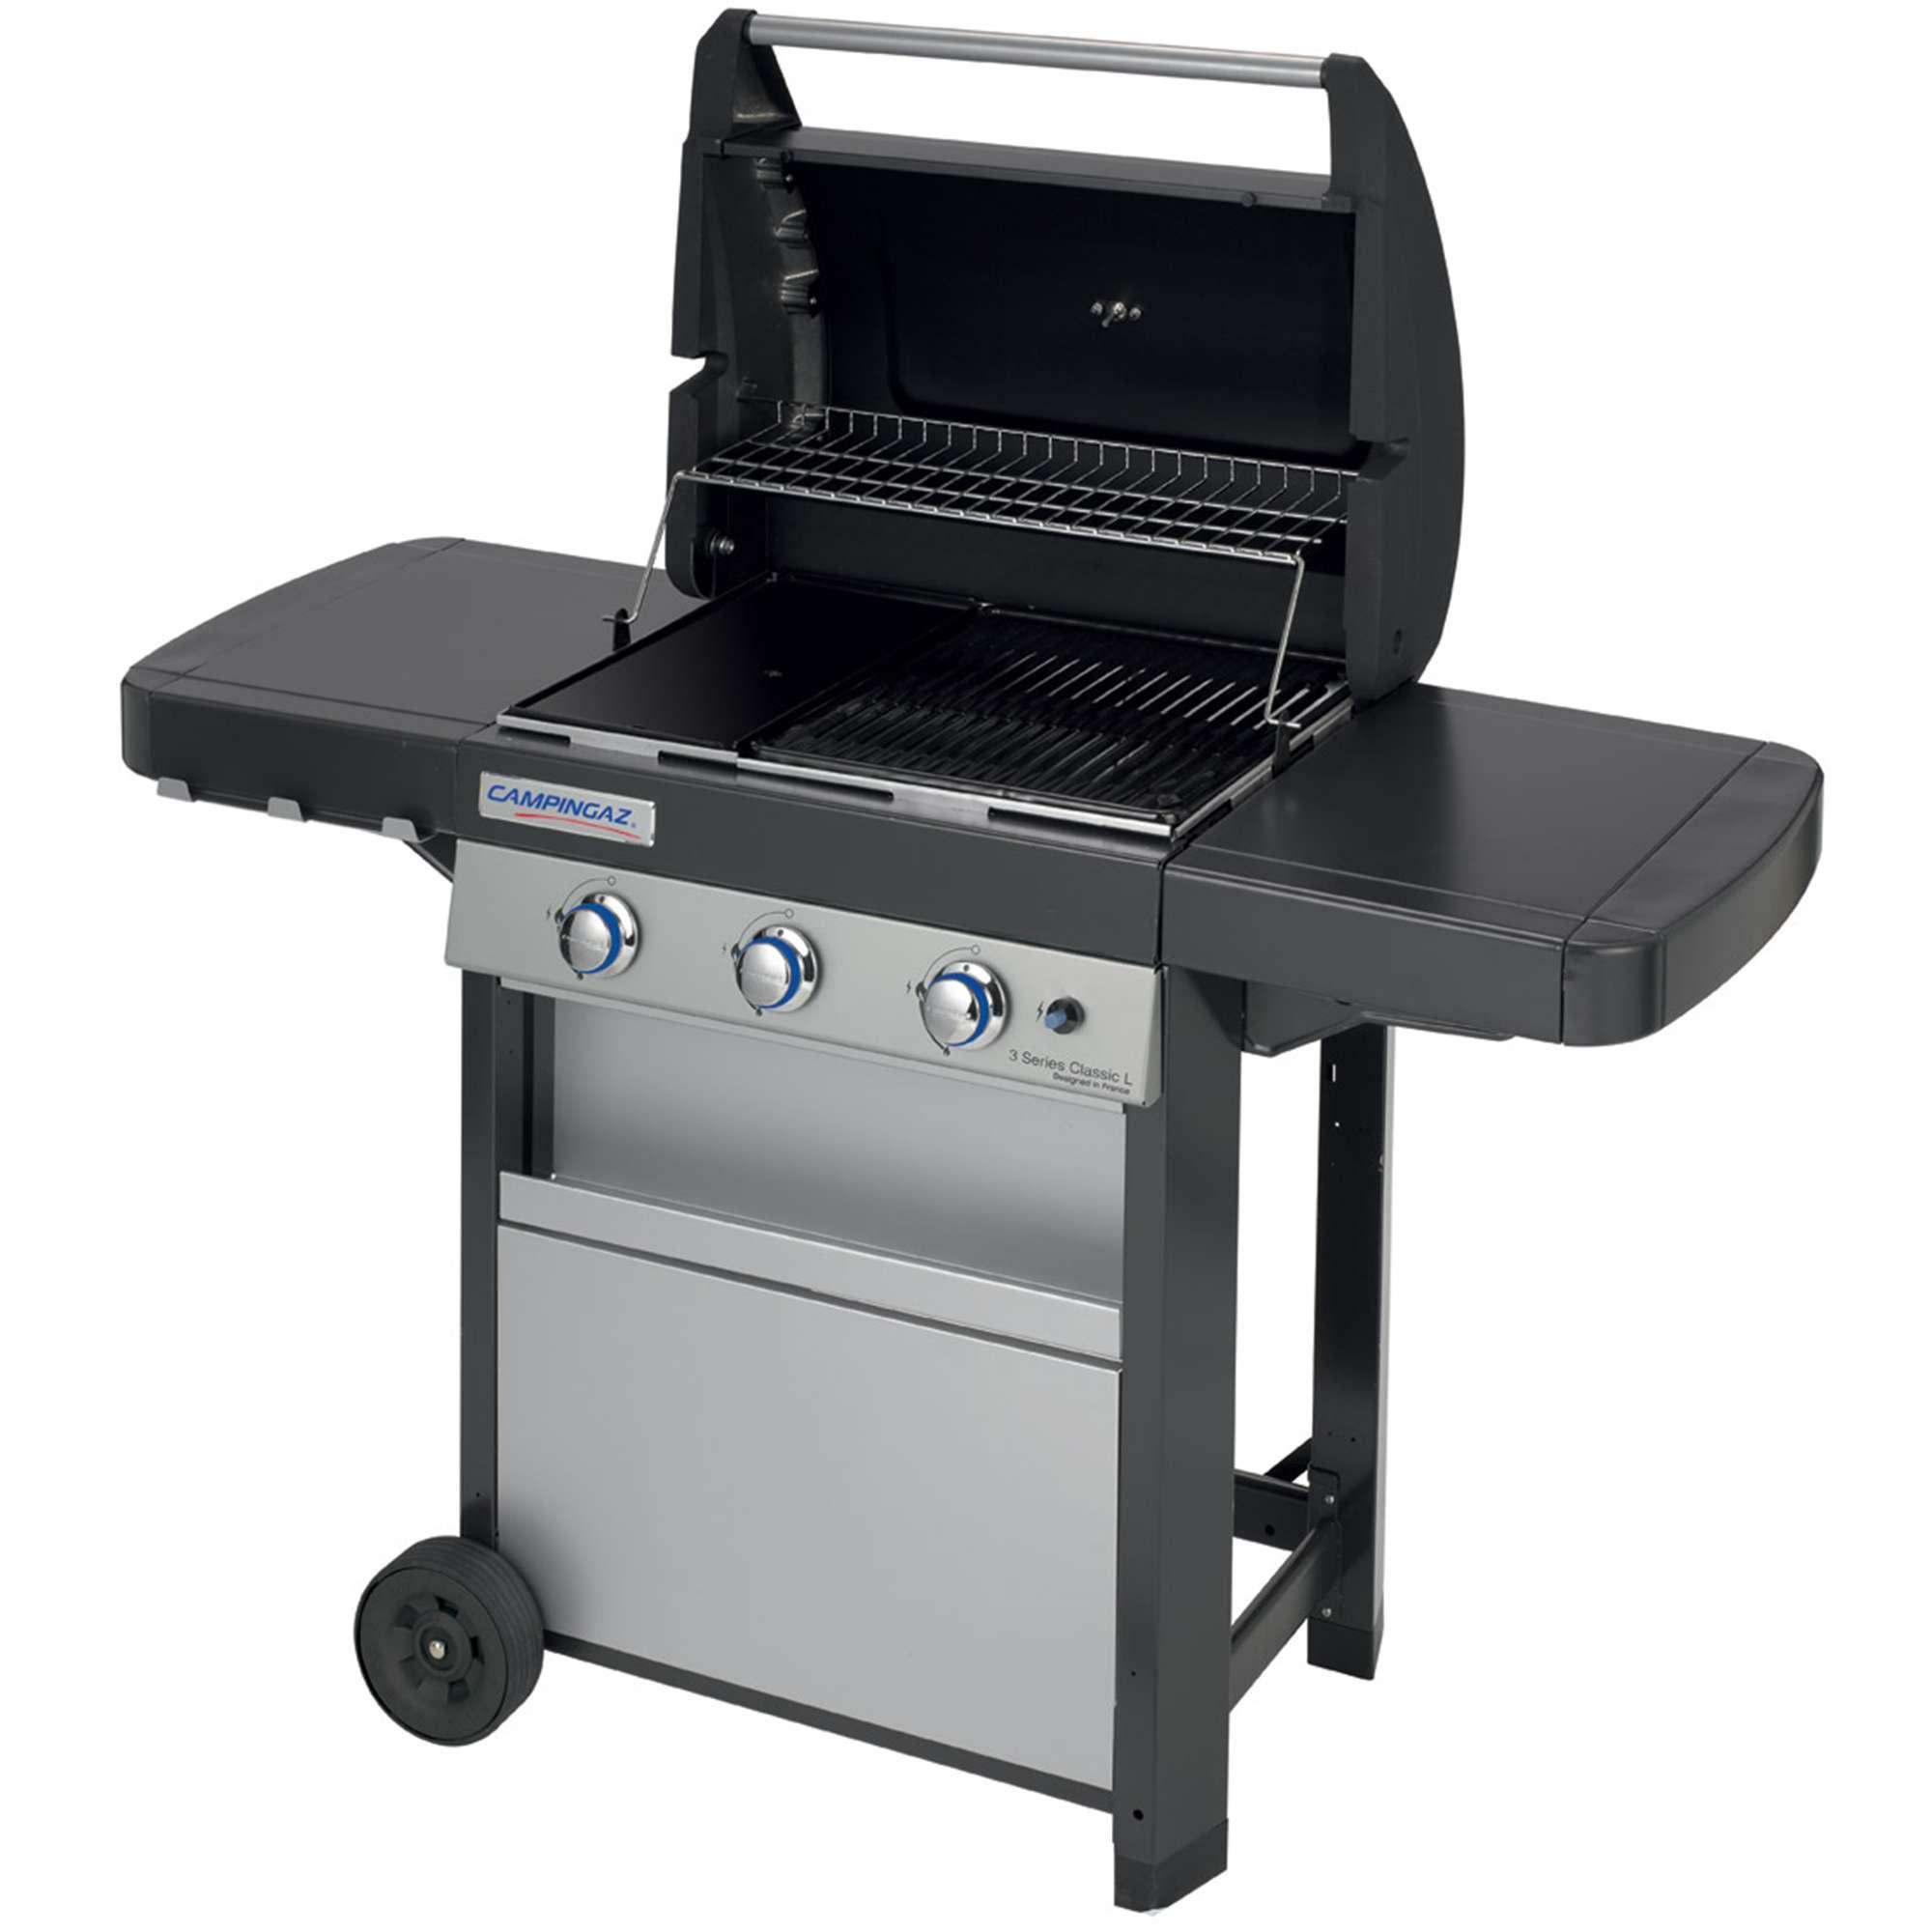 CAMPINGAZ 3 Series Classic L Barbecue